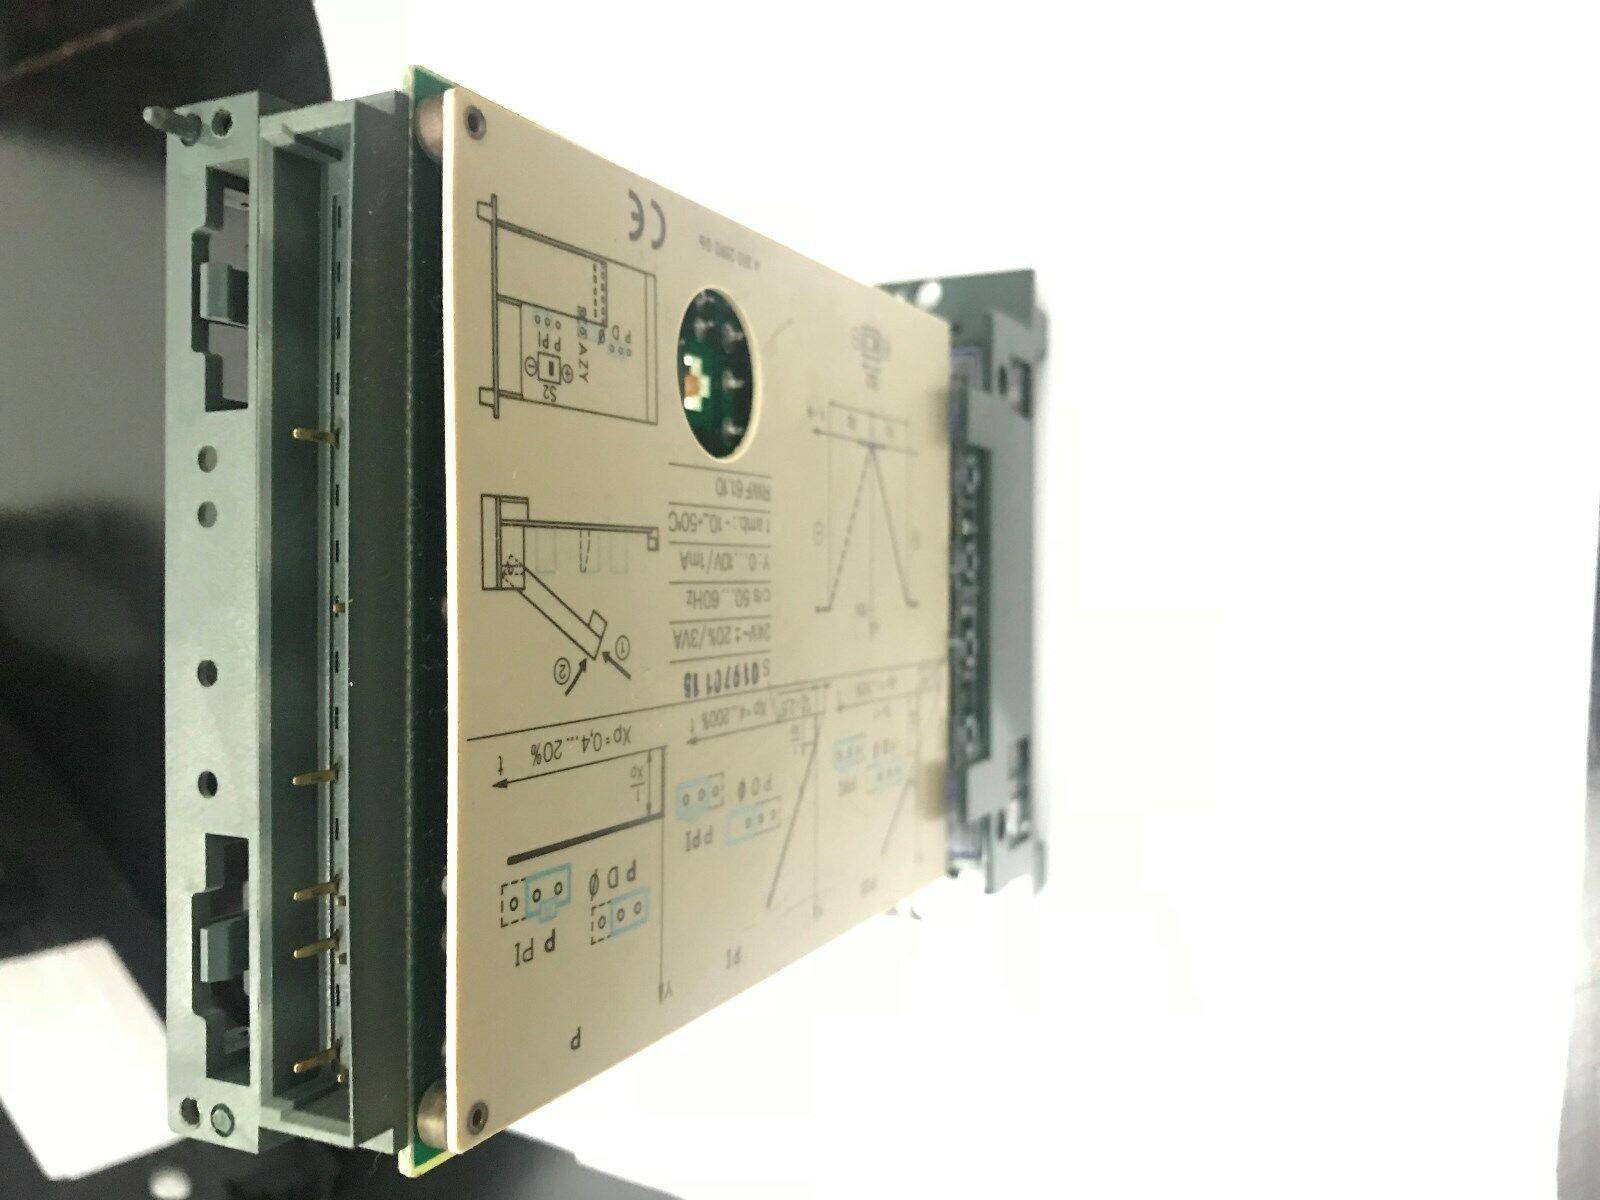 Landis /& Gyr polygyr ccm 61.40 control regulador régimen Controller rzm61.40 l/&g